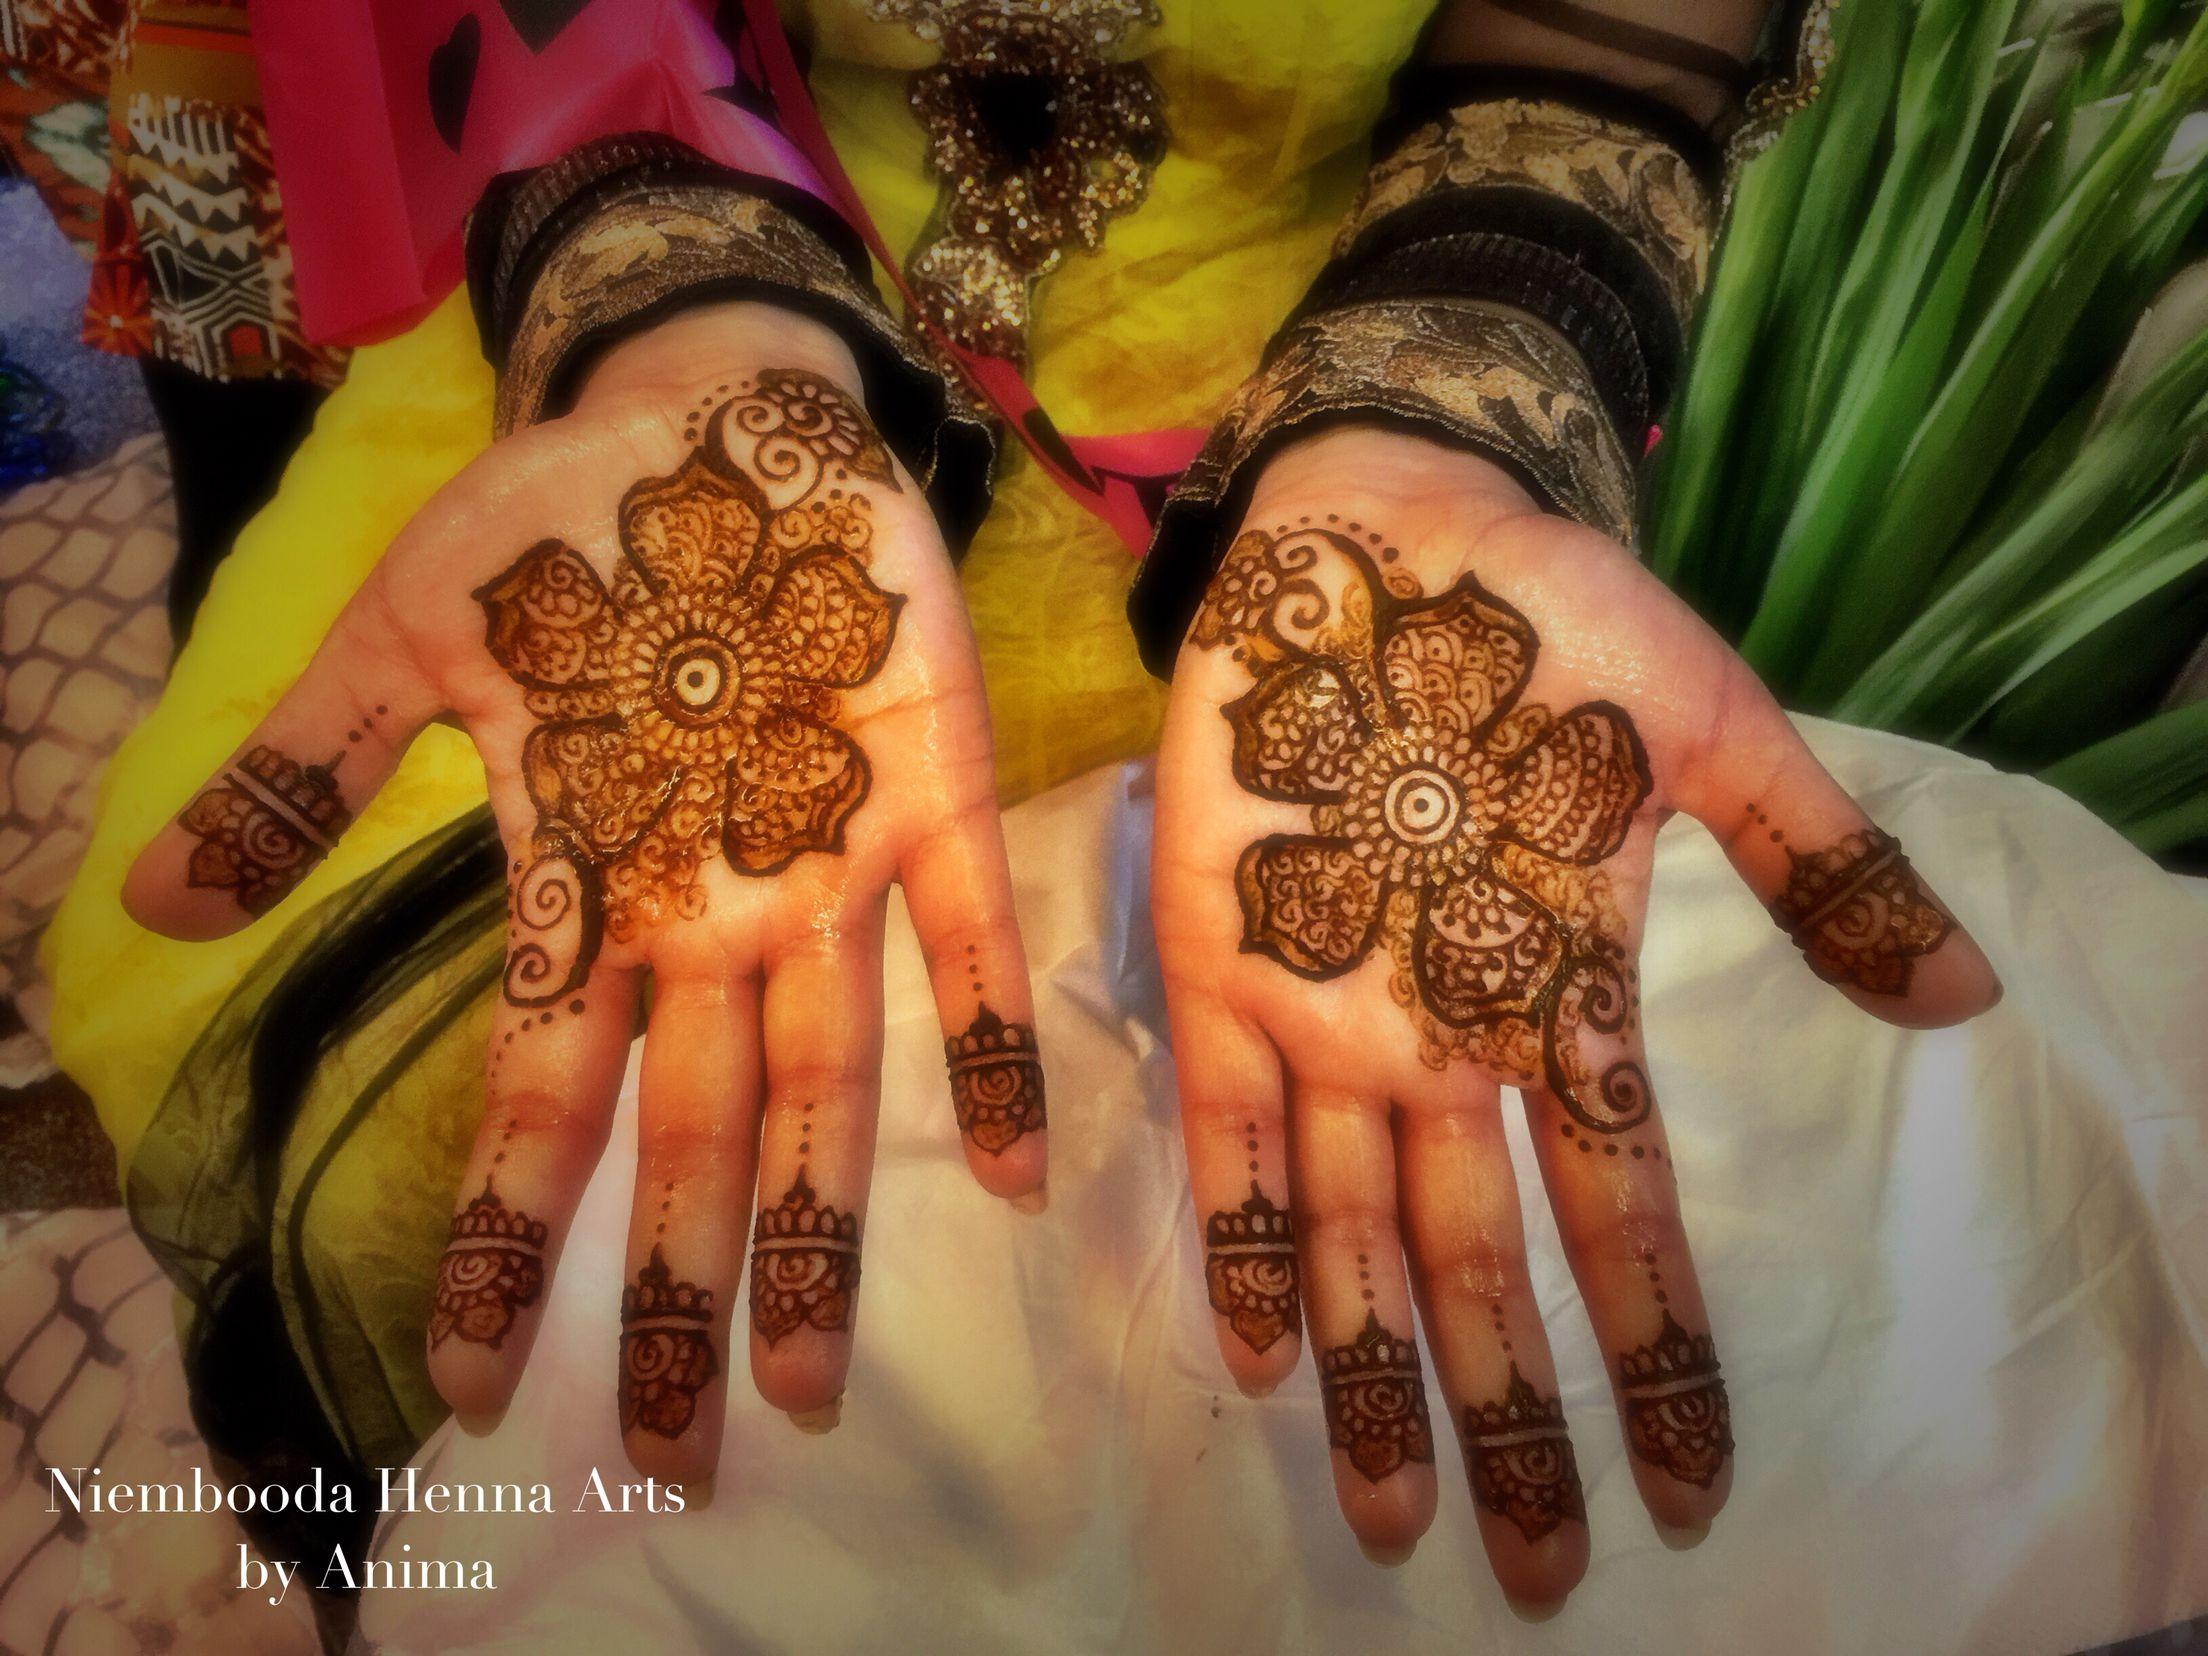 Mehndi Hand Name : Bridal mehndi chique the letter r is hidden in design